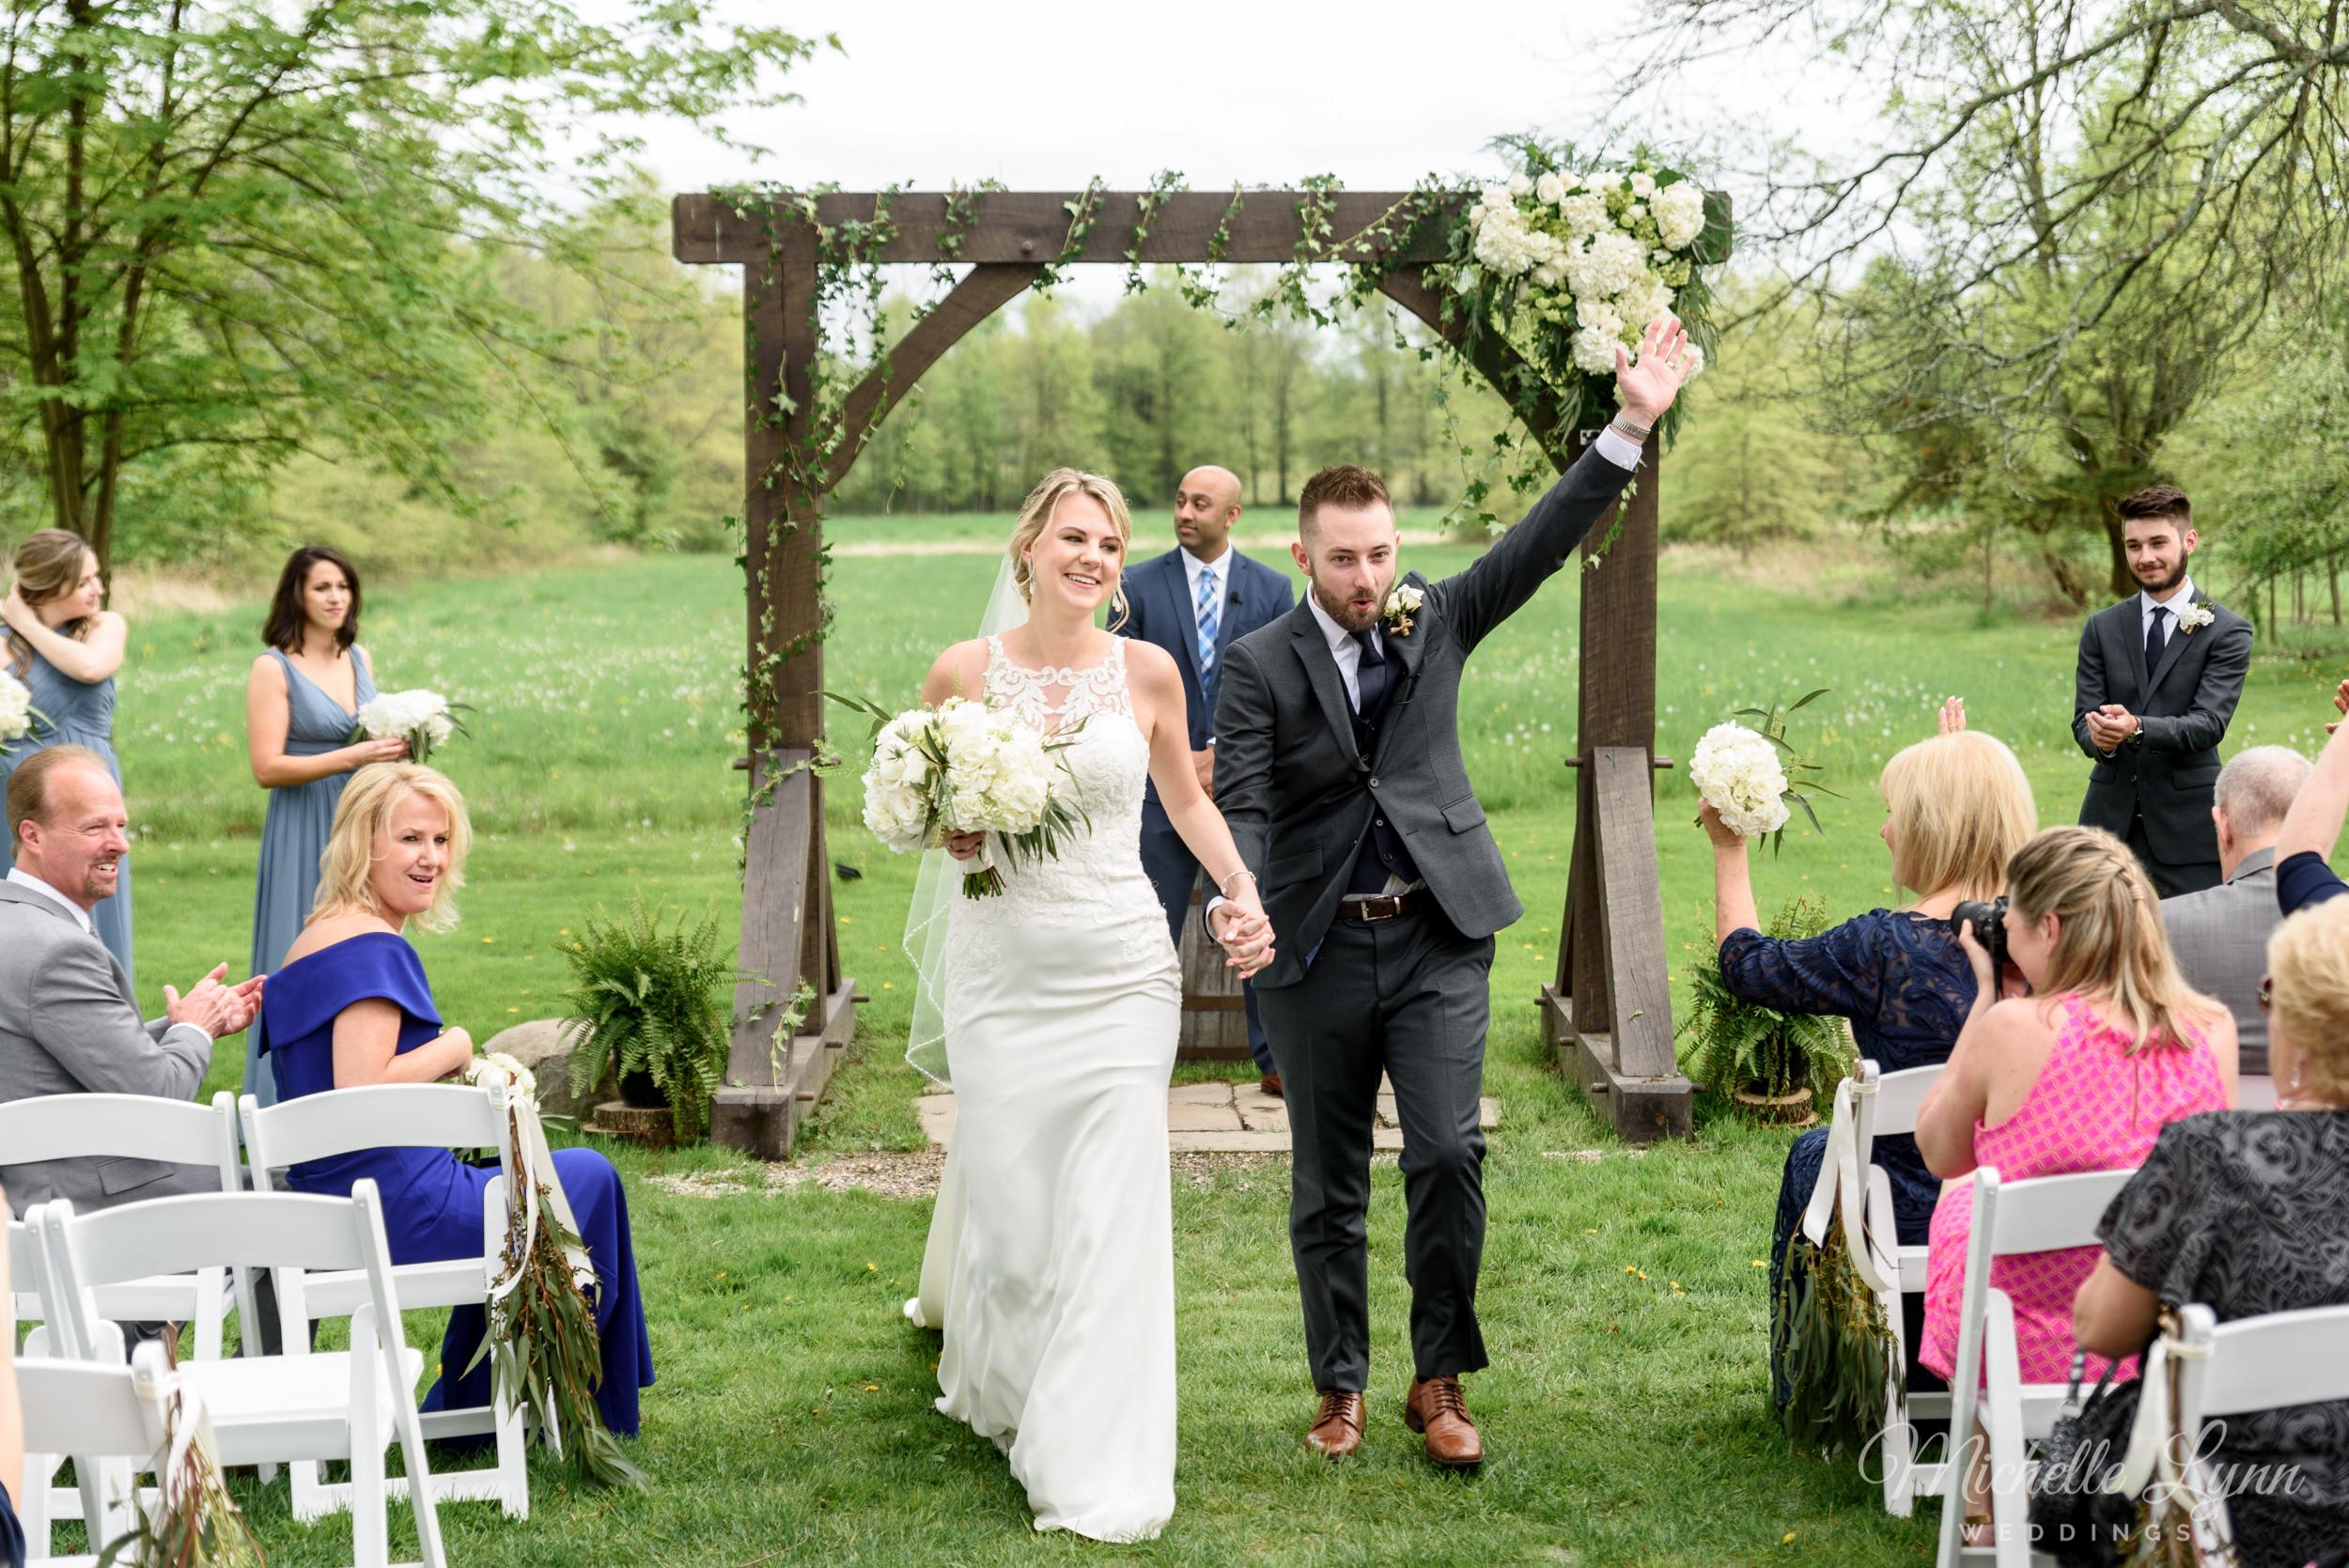 mlw-the-farm-bakery-and-events-wedding-photos-46.jpg